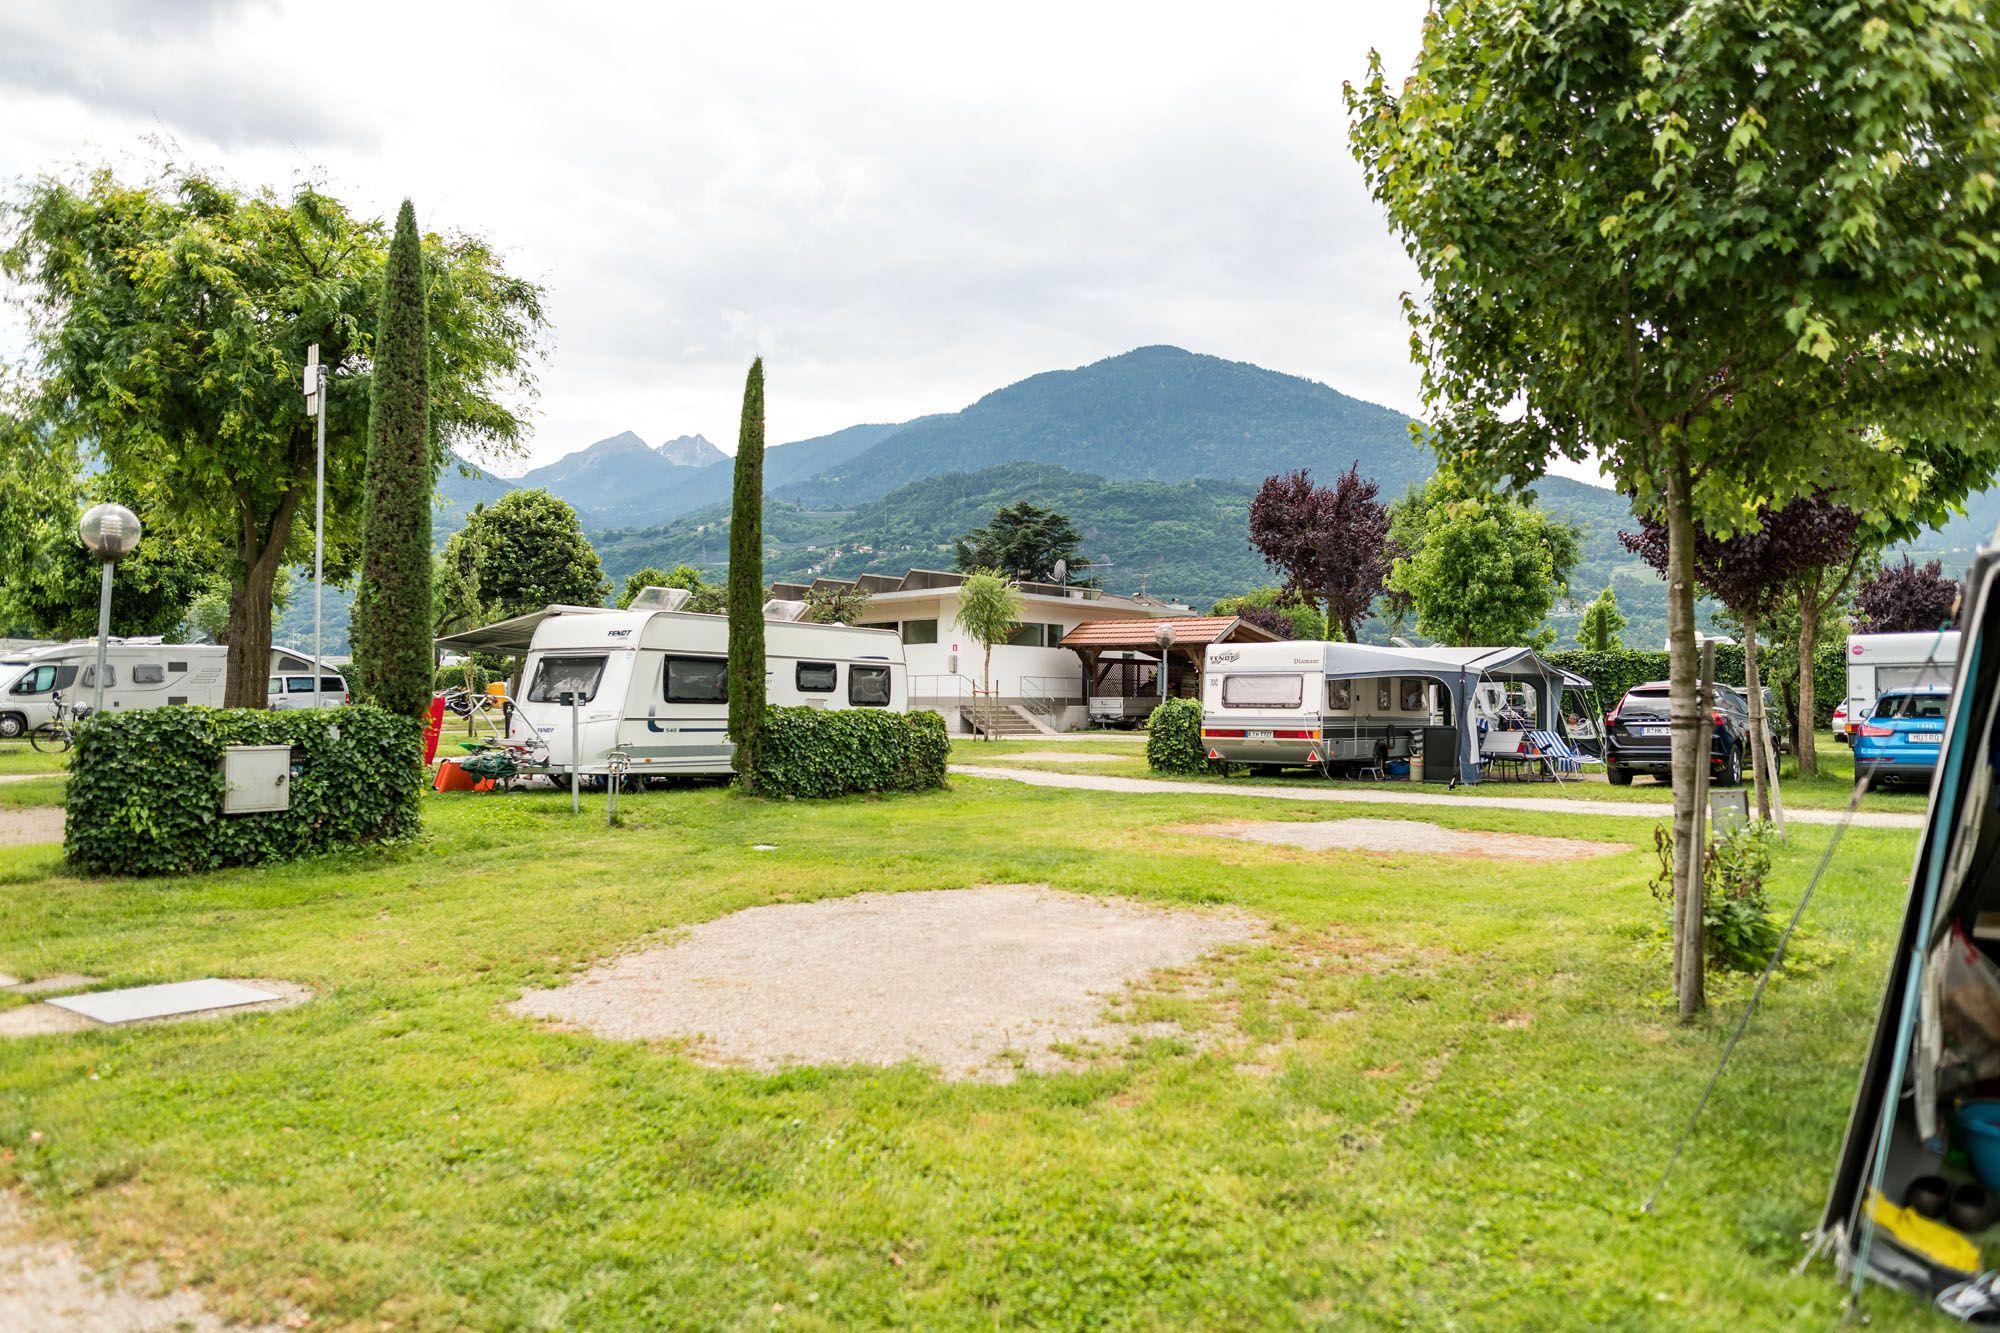 Comune Di Lana Bz campeggio camping arquin lana a lana in via feldagatterweg